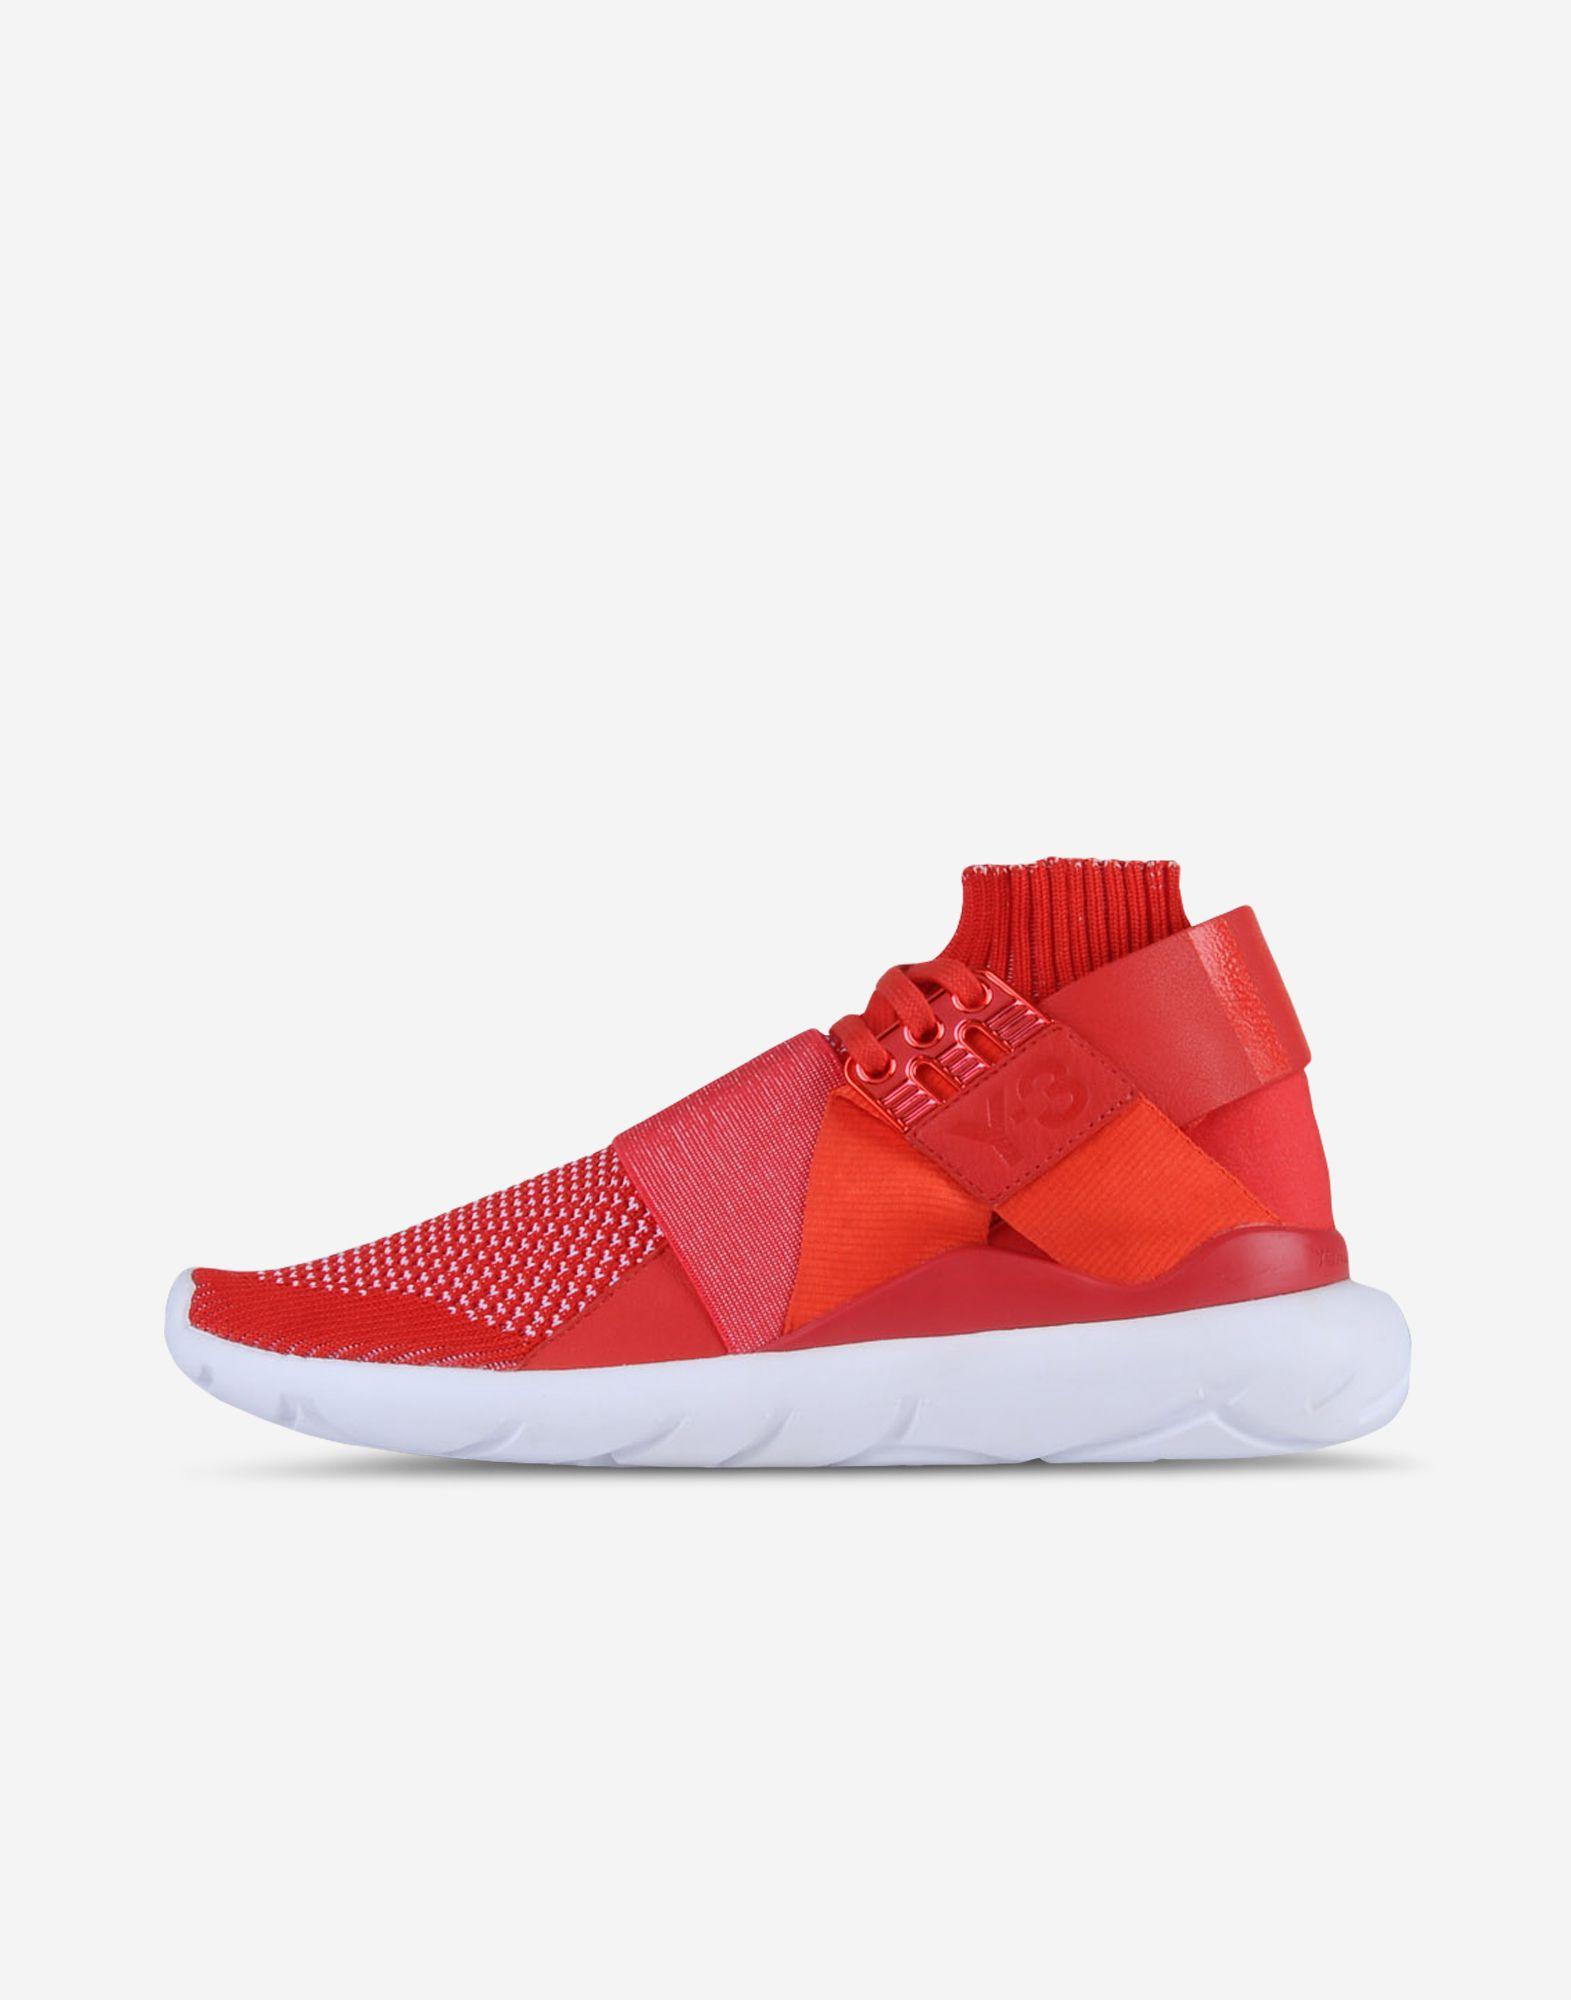 ... Y-3 Y-3 QASA ELLE LACE KNIT Sneakers Woman f ... 21ee341c66